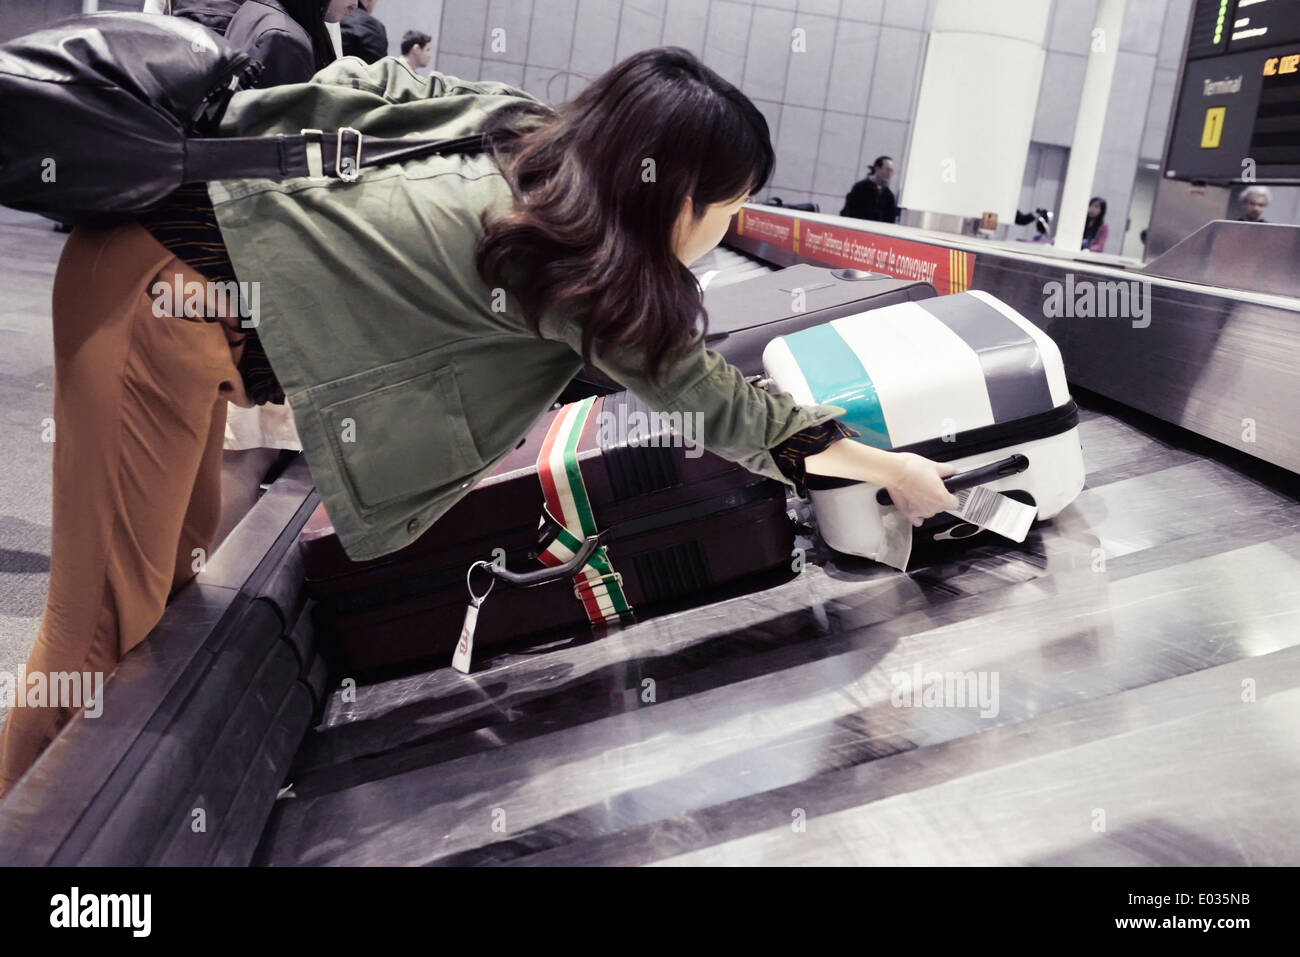 Frau, die Abholung der Koffer vom Flughafen Gepäck Förderer an Toronto Pearson internationaler Flughafen Gepäck Anspruch, Kanada Stockbild